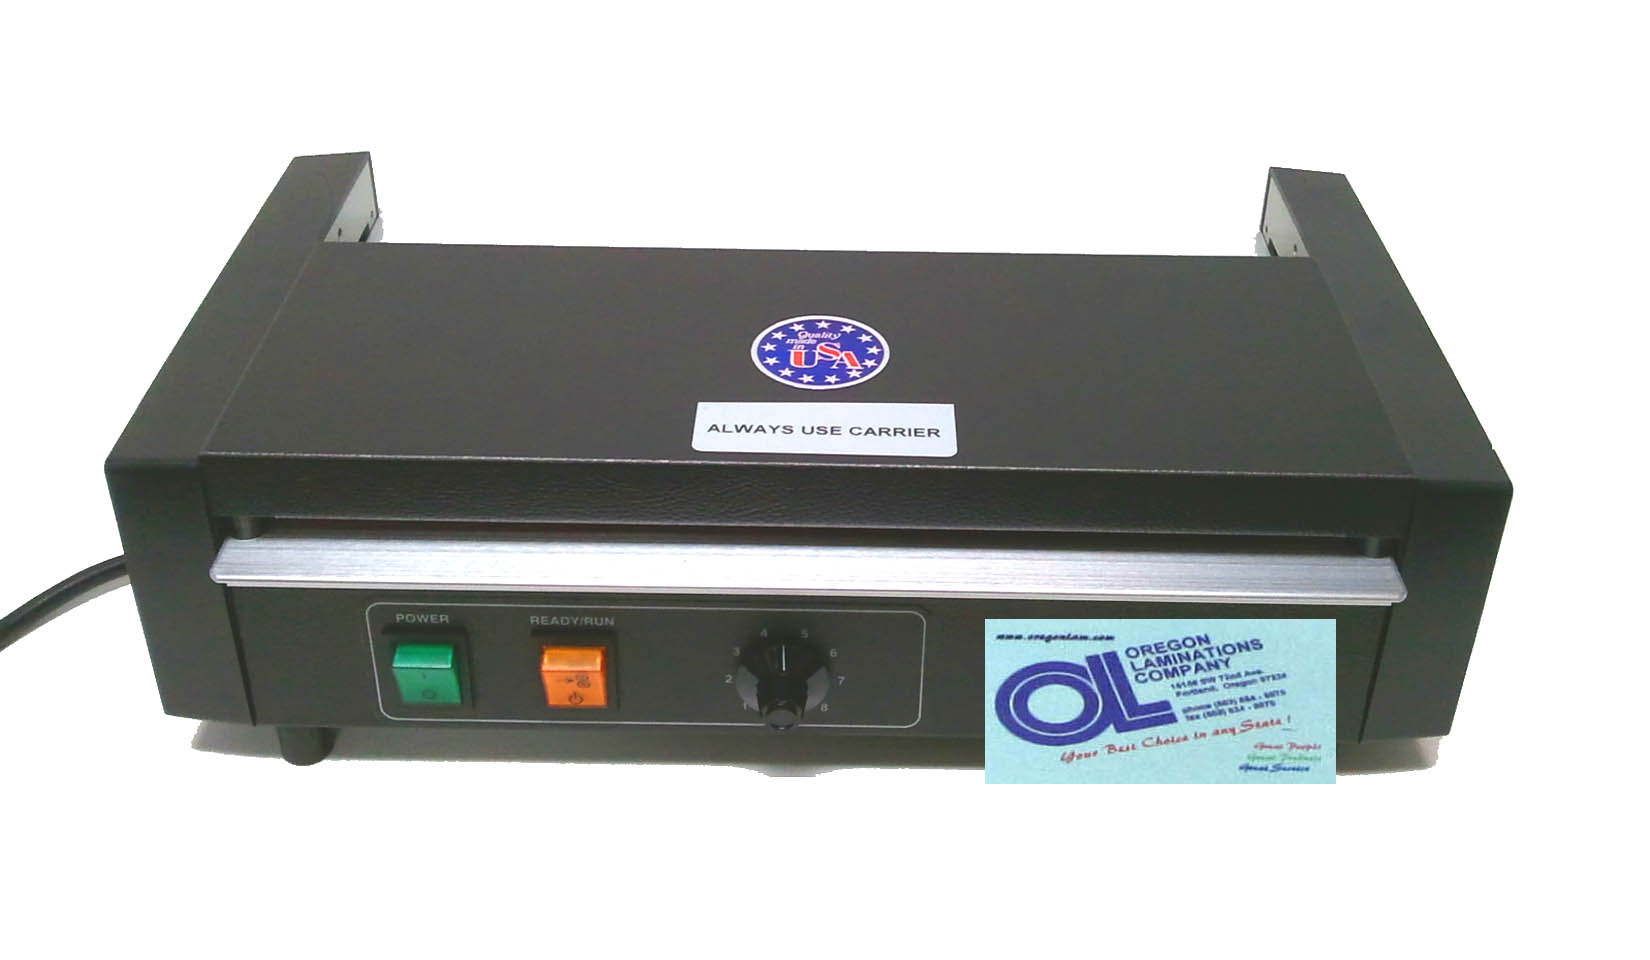 TLC 5000 pouch laminator